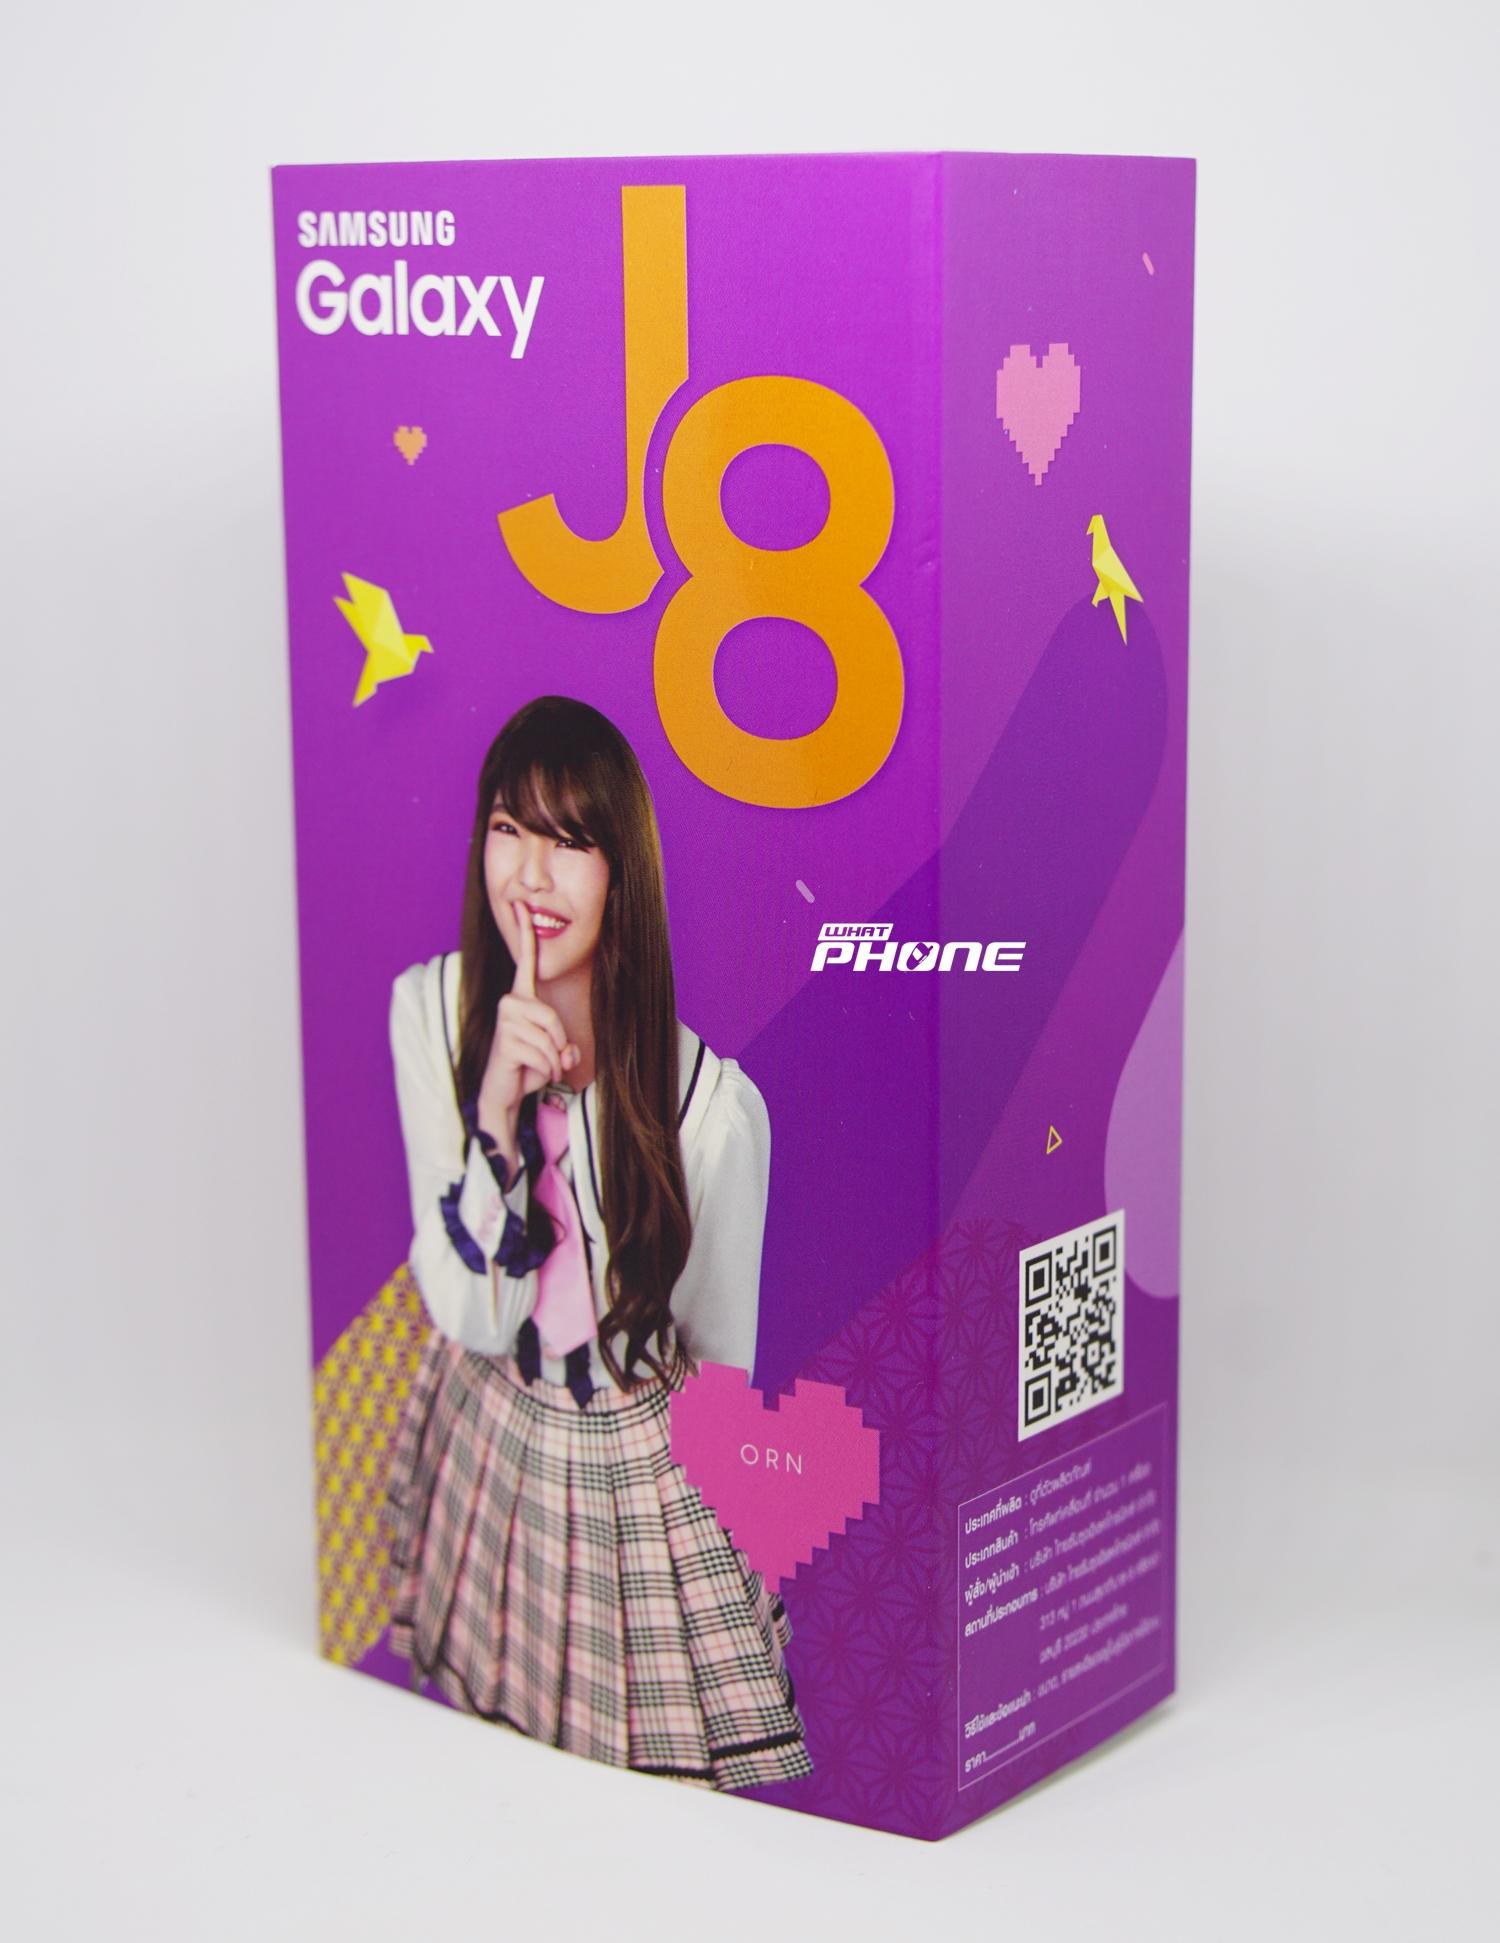 Samsung Galaxy J8 x BNK48 Limited Edition BOXSET Unboxing (30)